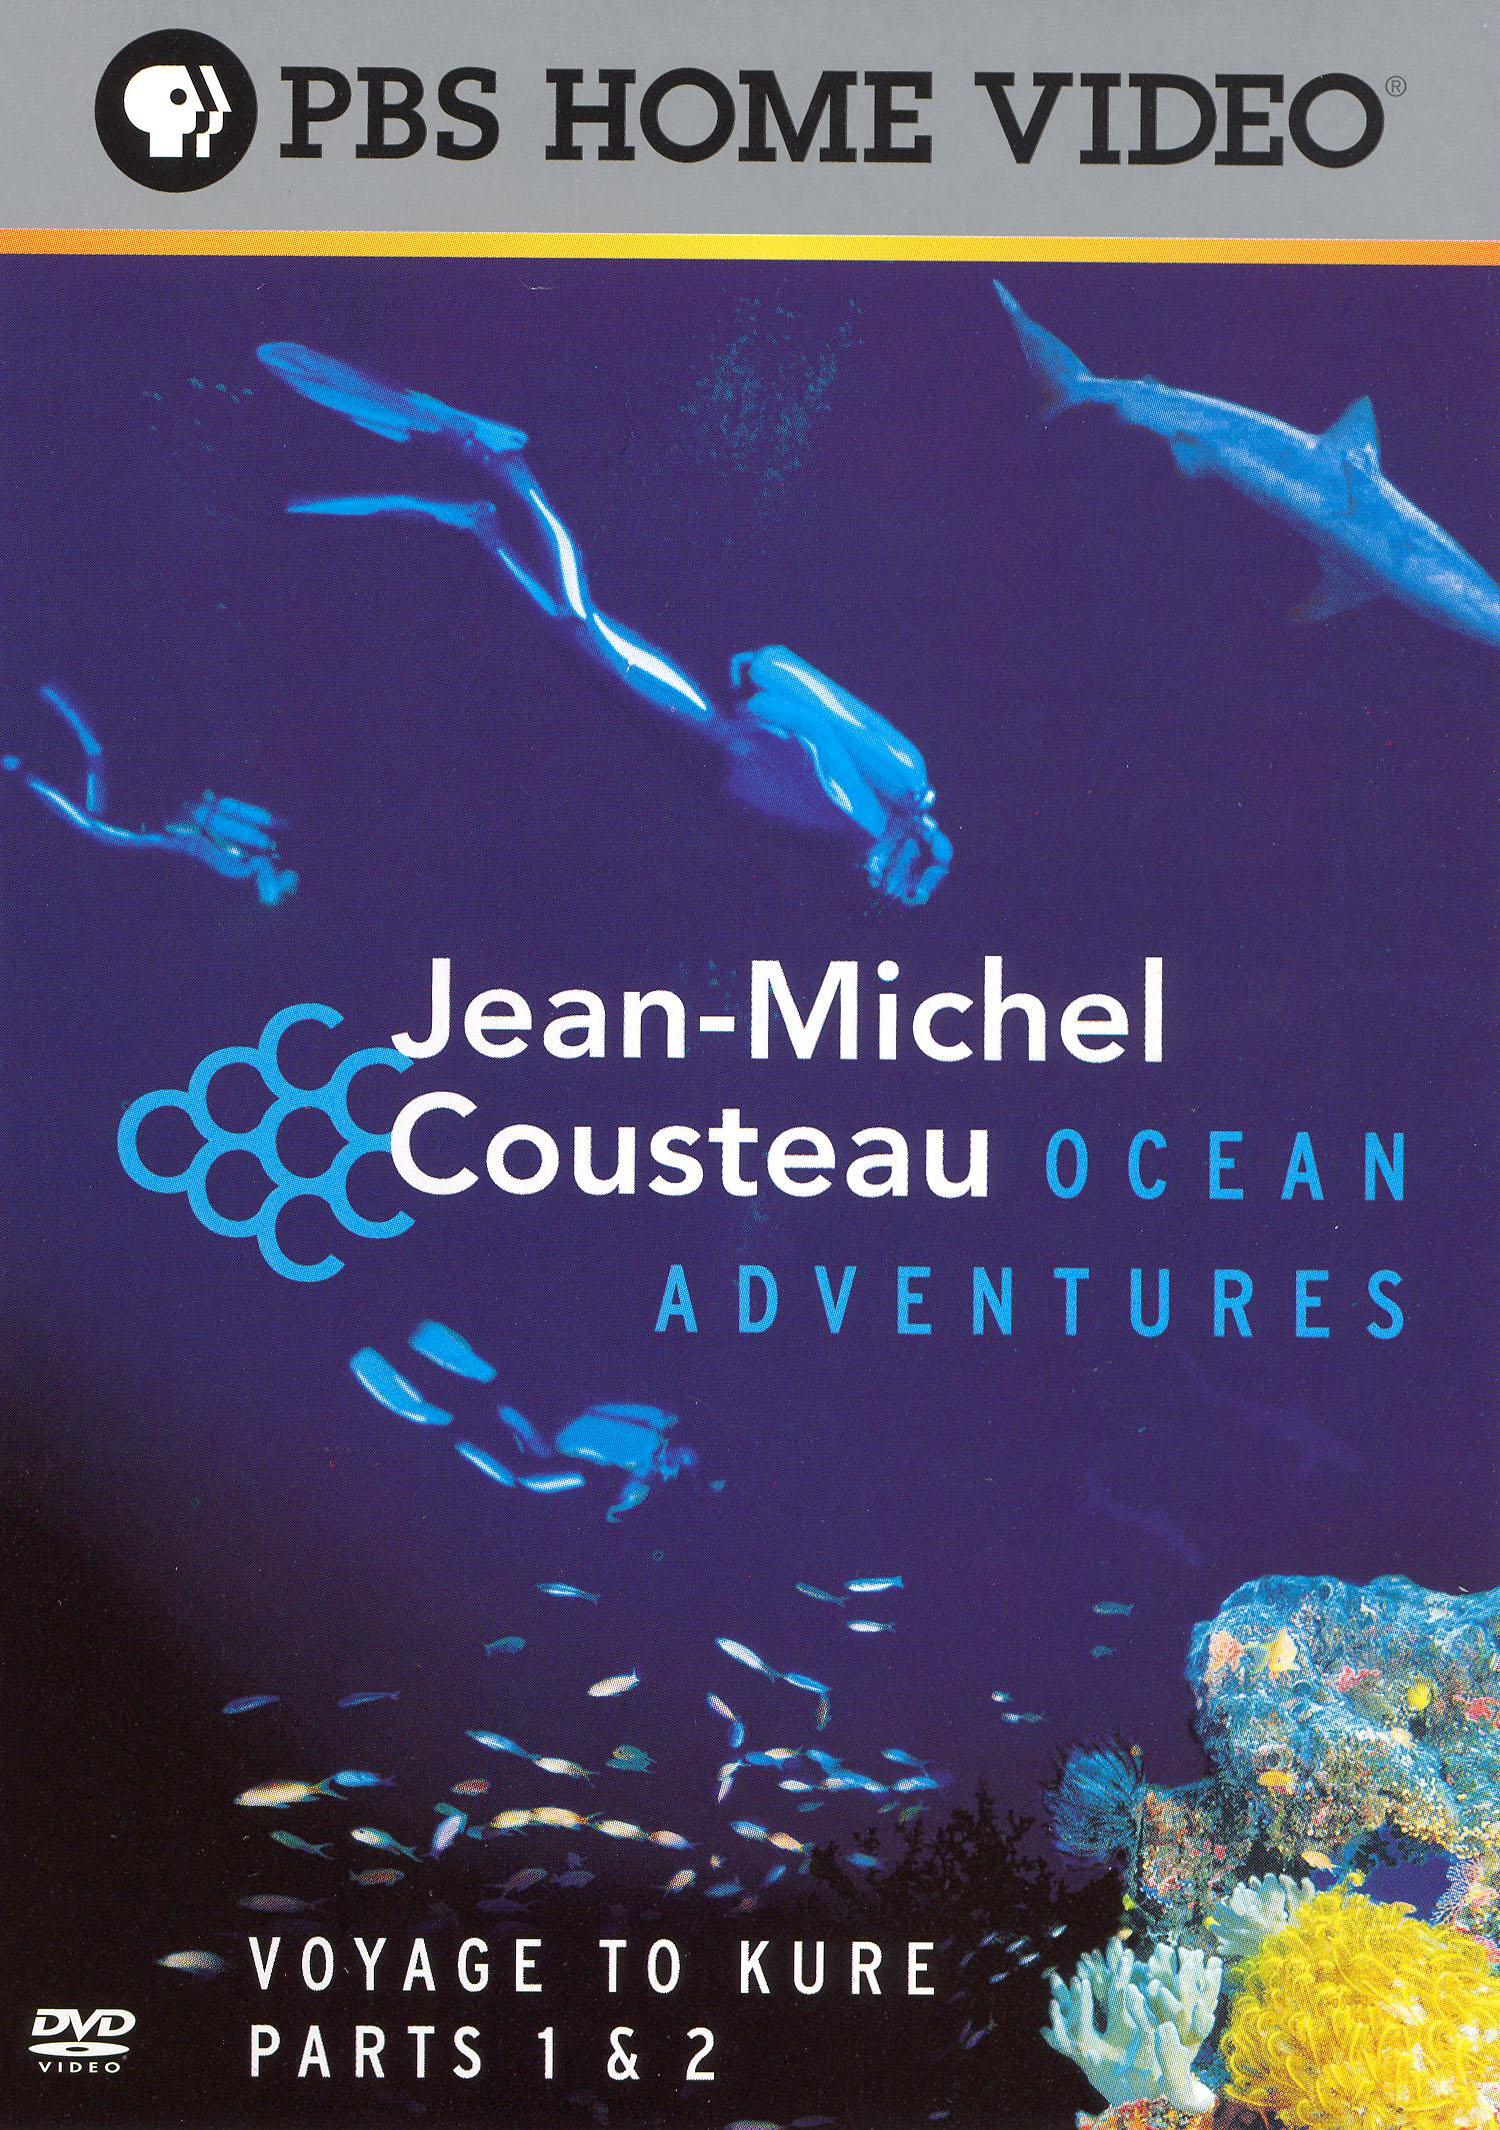 Jean-Michel Cousteau's Ocean Adventures